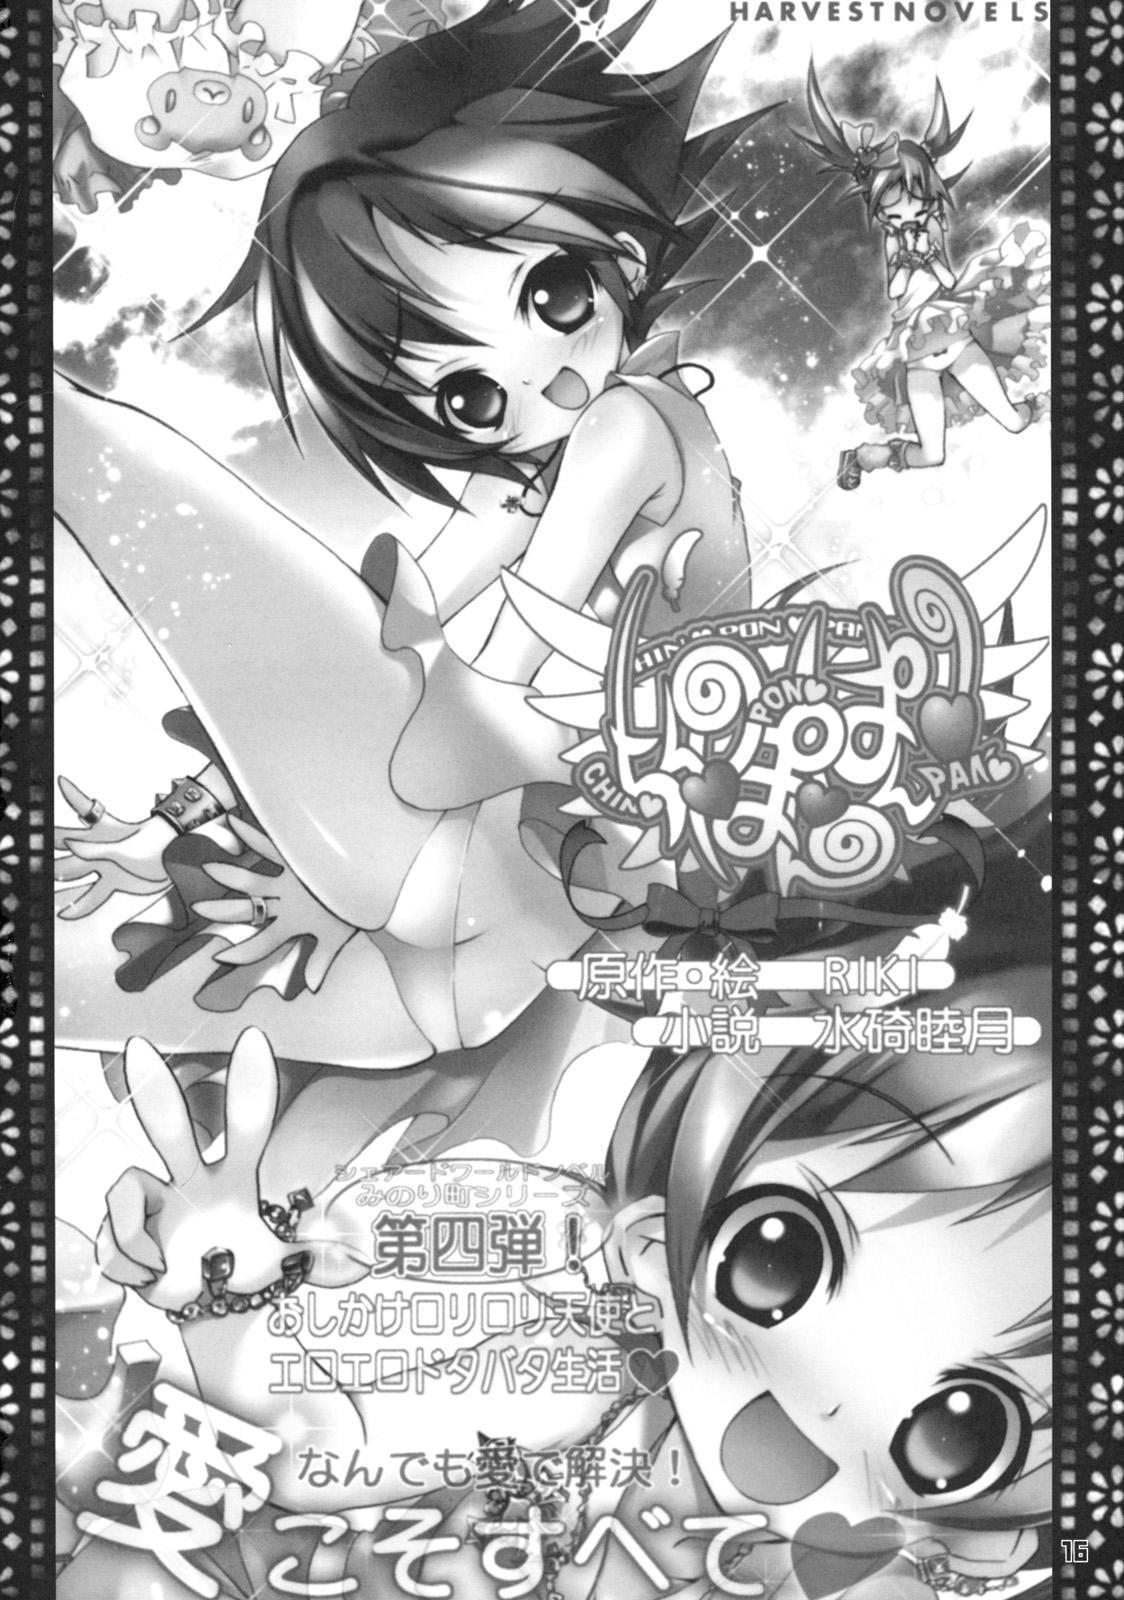 Paipai de Chinchin ga Dobadoban Special Edition 13